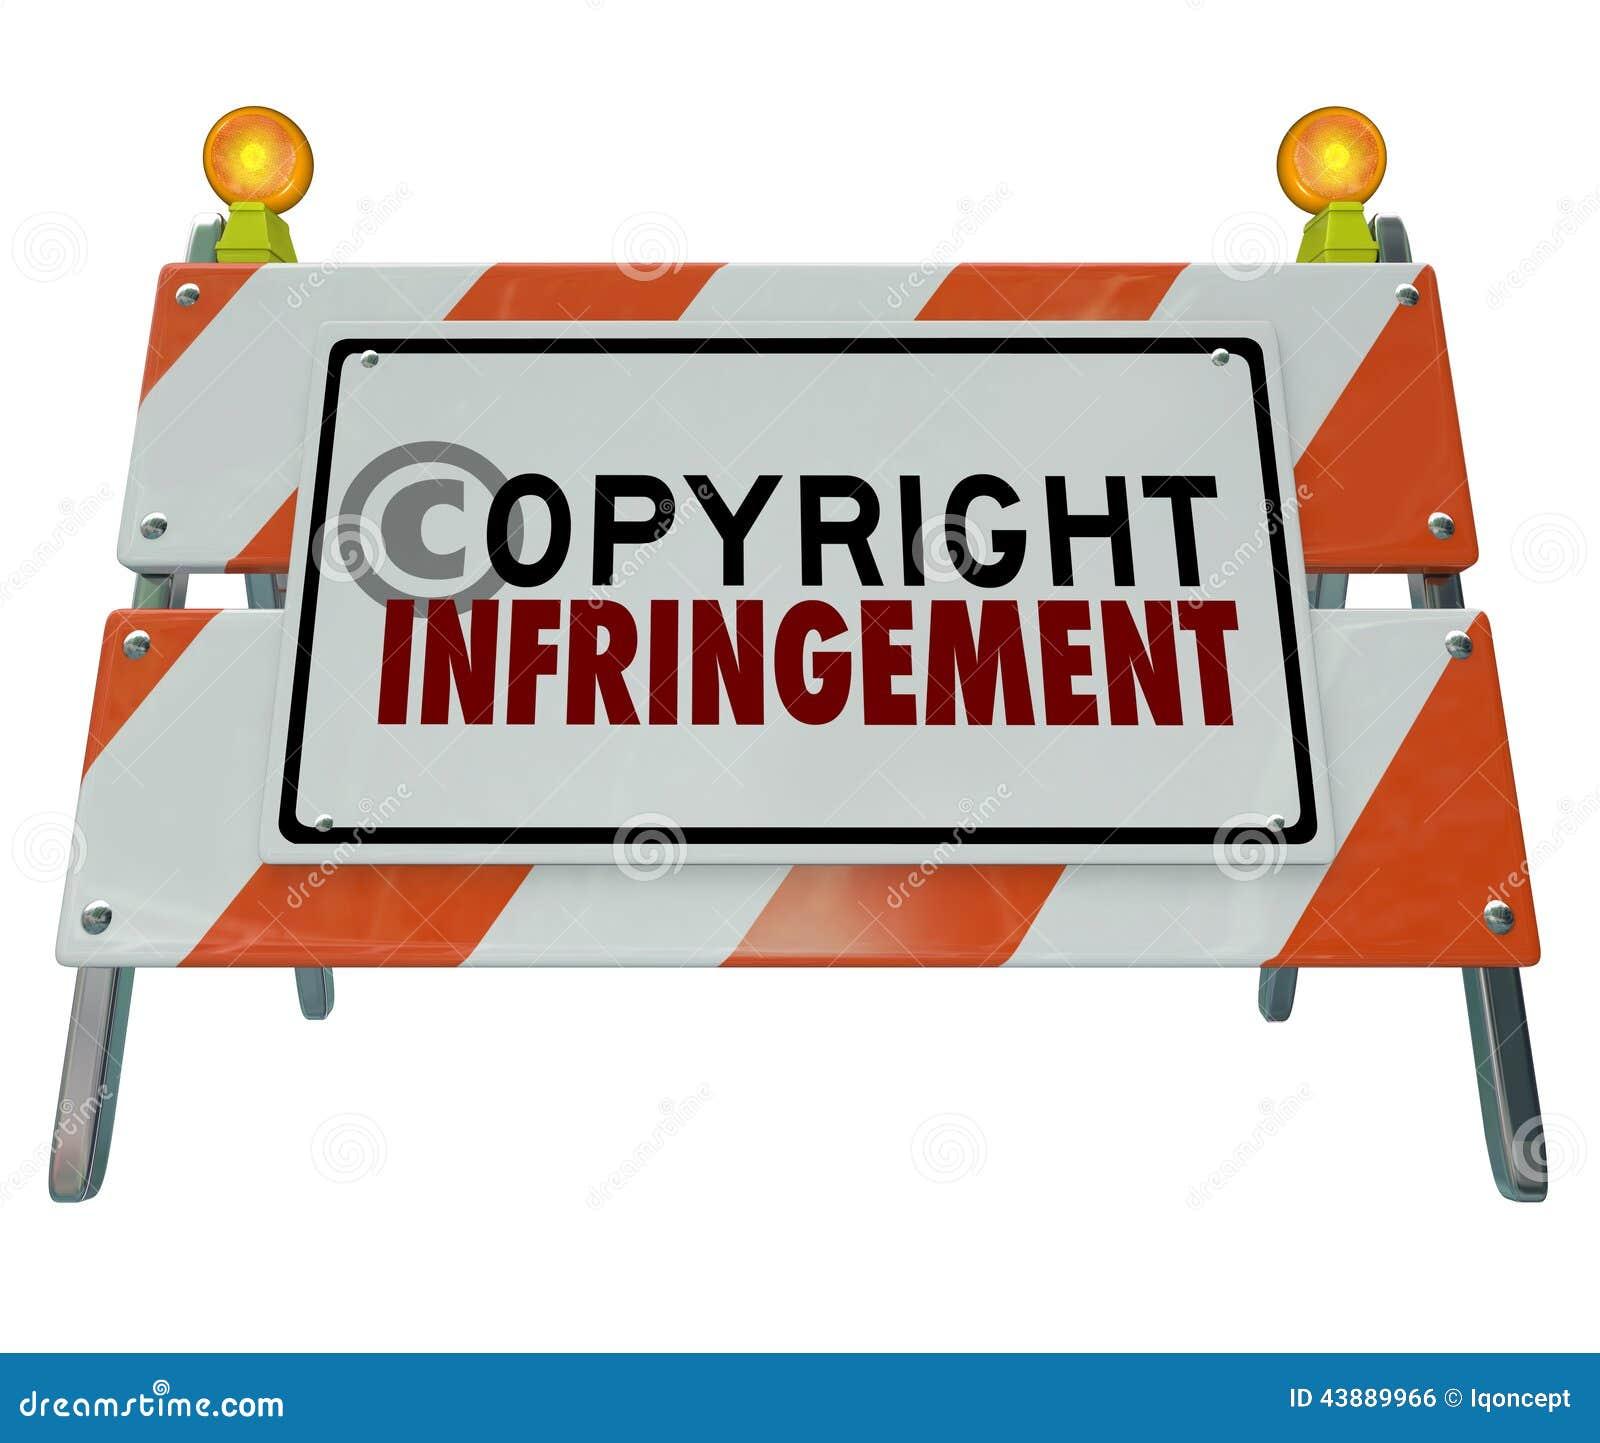 Intellectual Property Violations